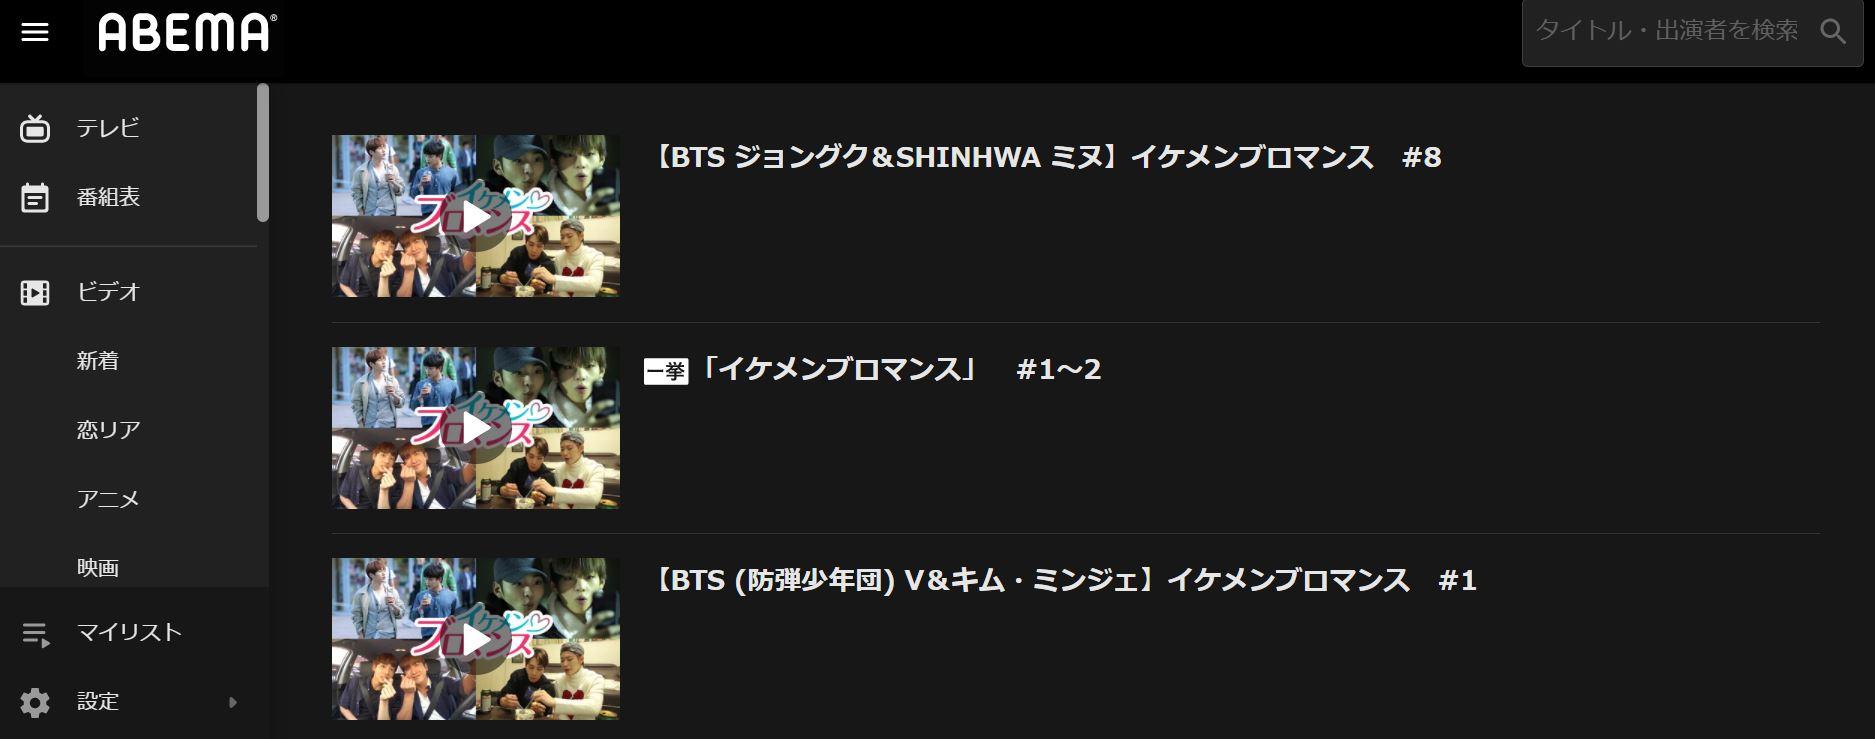 BTSのイケメンブロマンスの動画